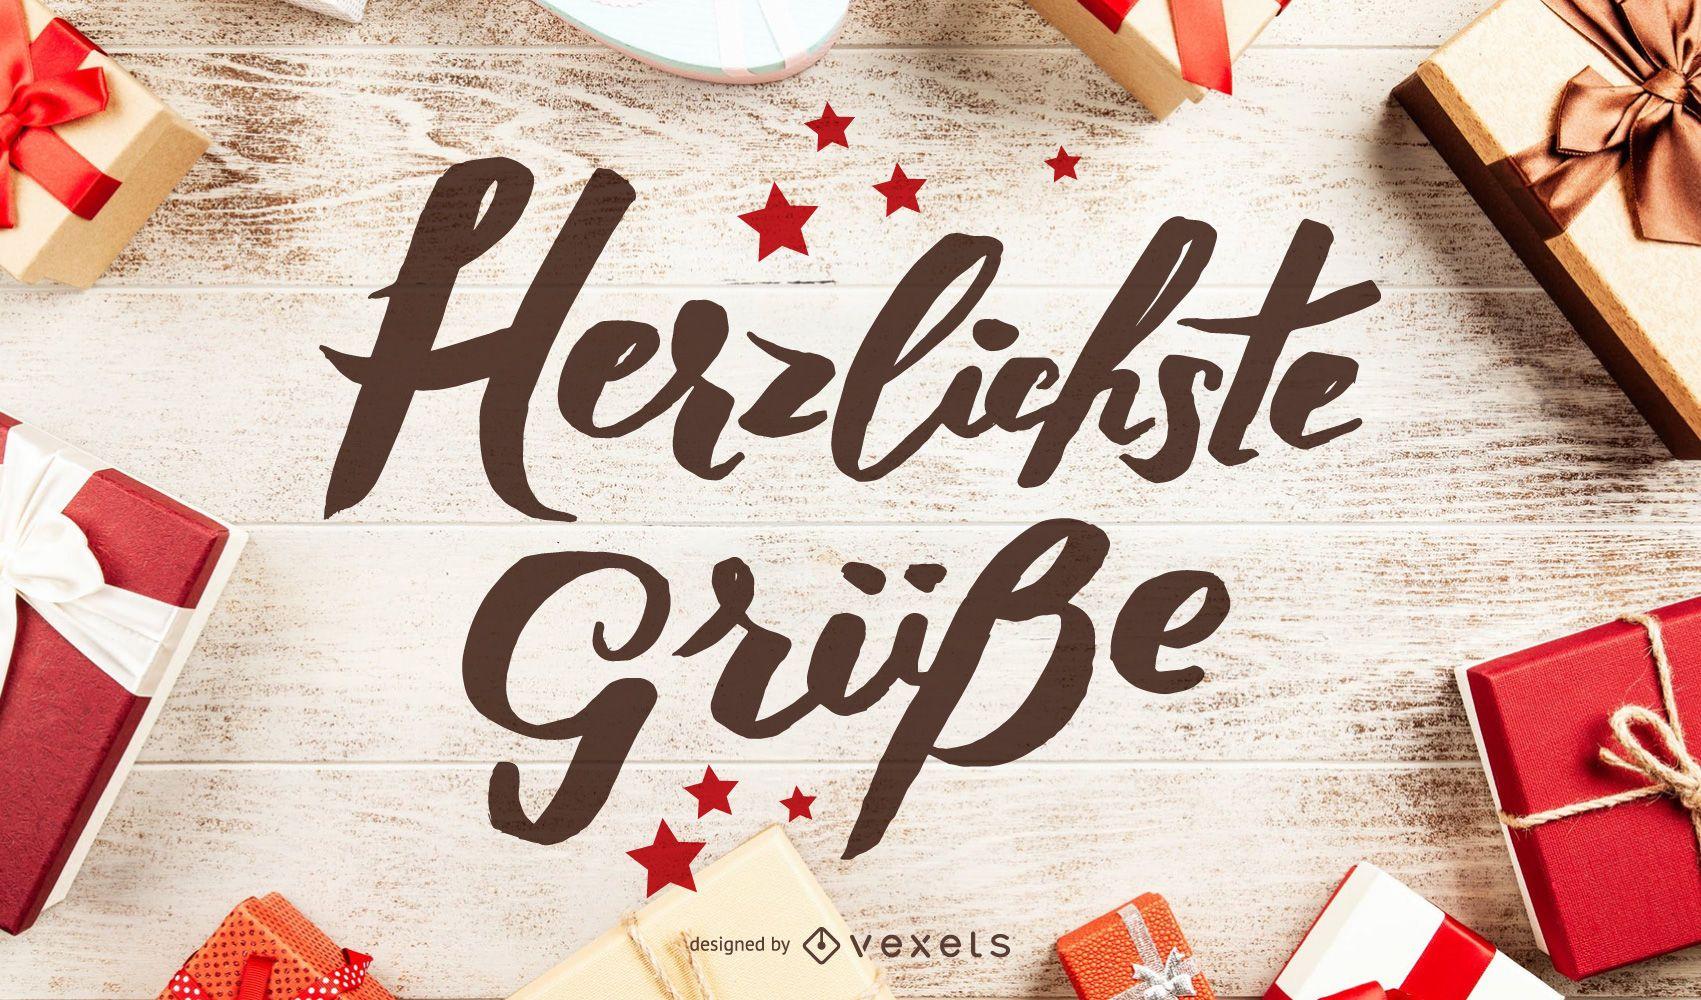 Herzlichste GrüÃ ?? e Letras de Año Nuevo Alemán